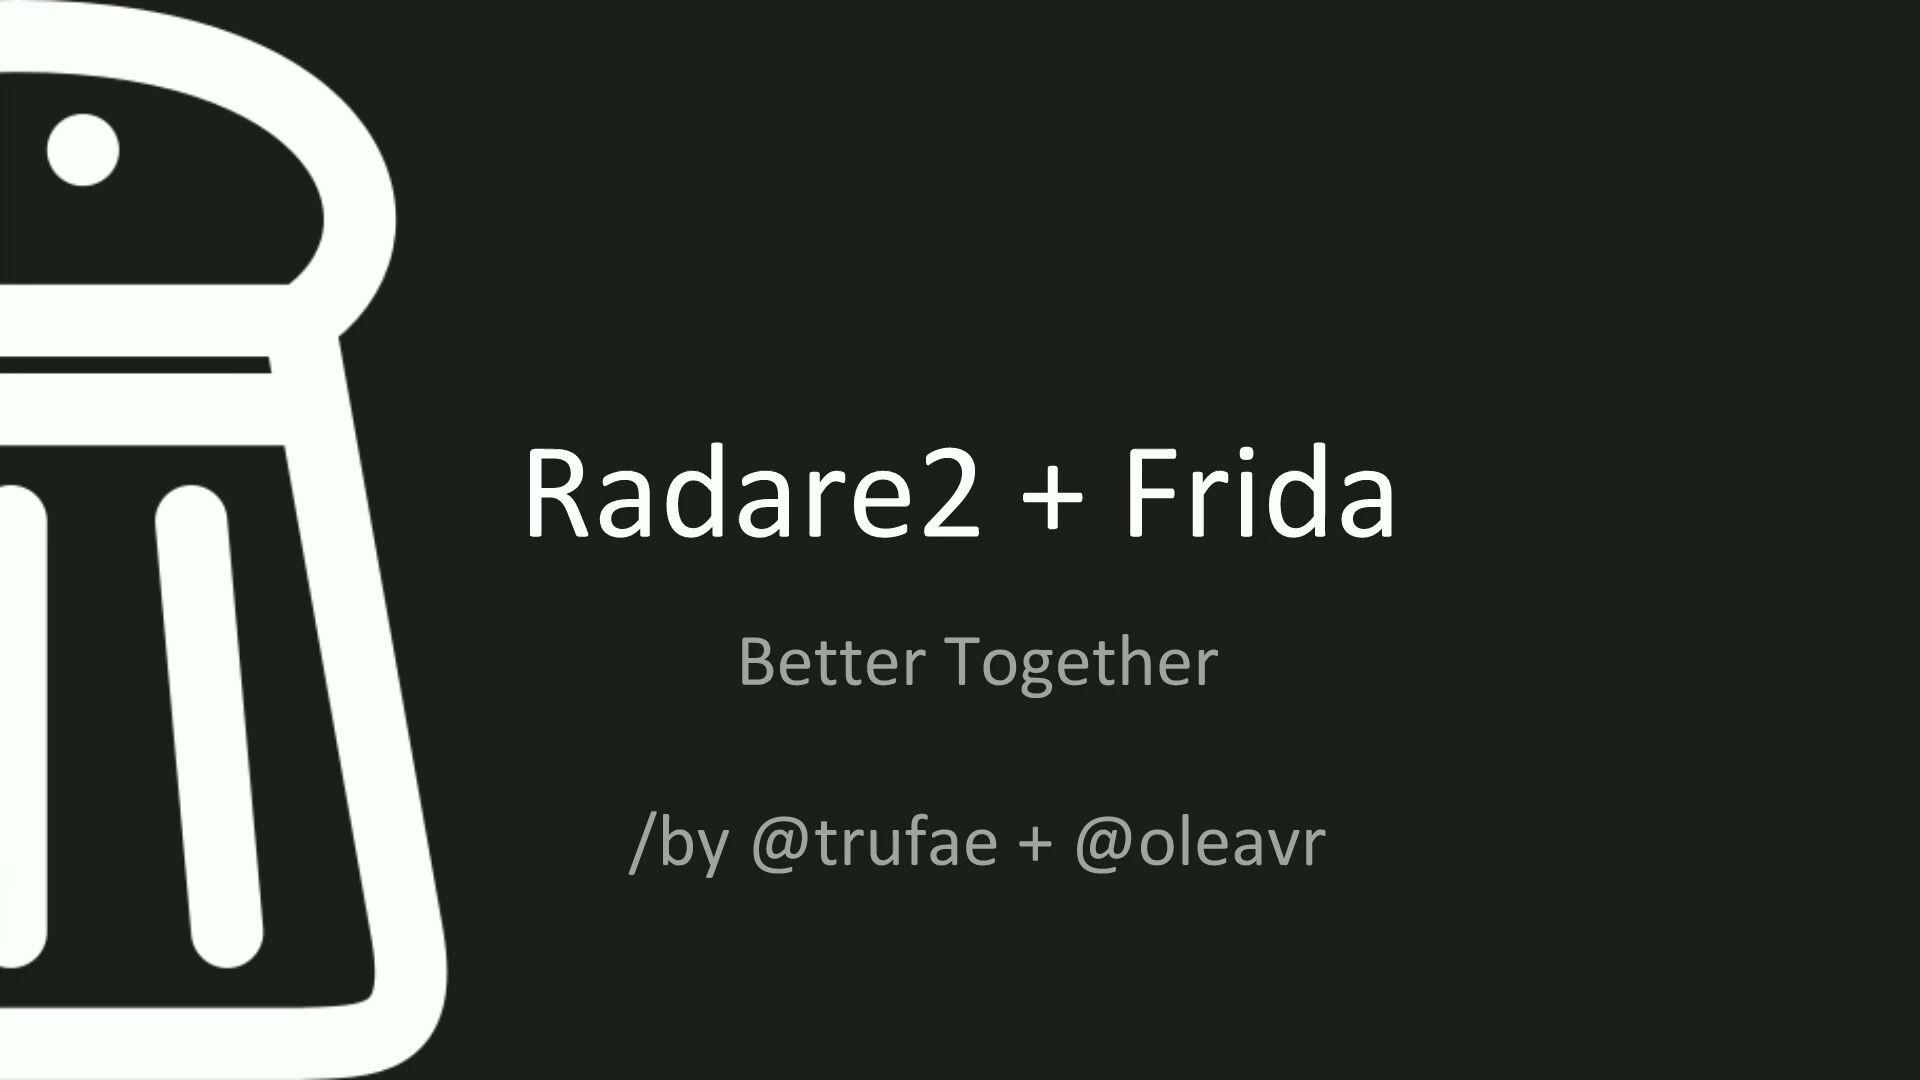 r2frida - Better Together - les archives de Pass the SALT